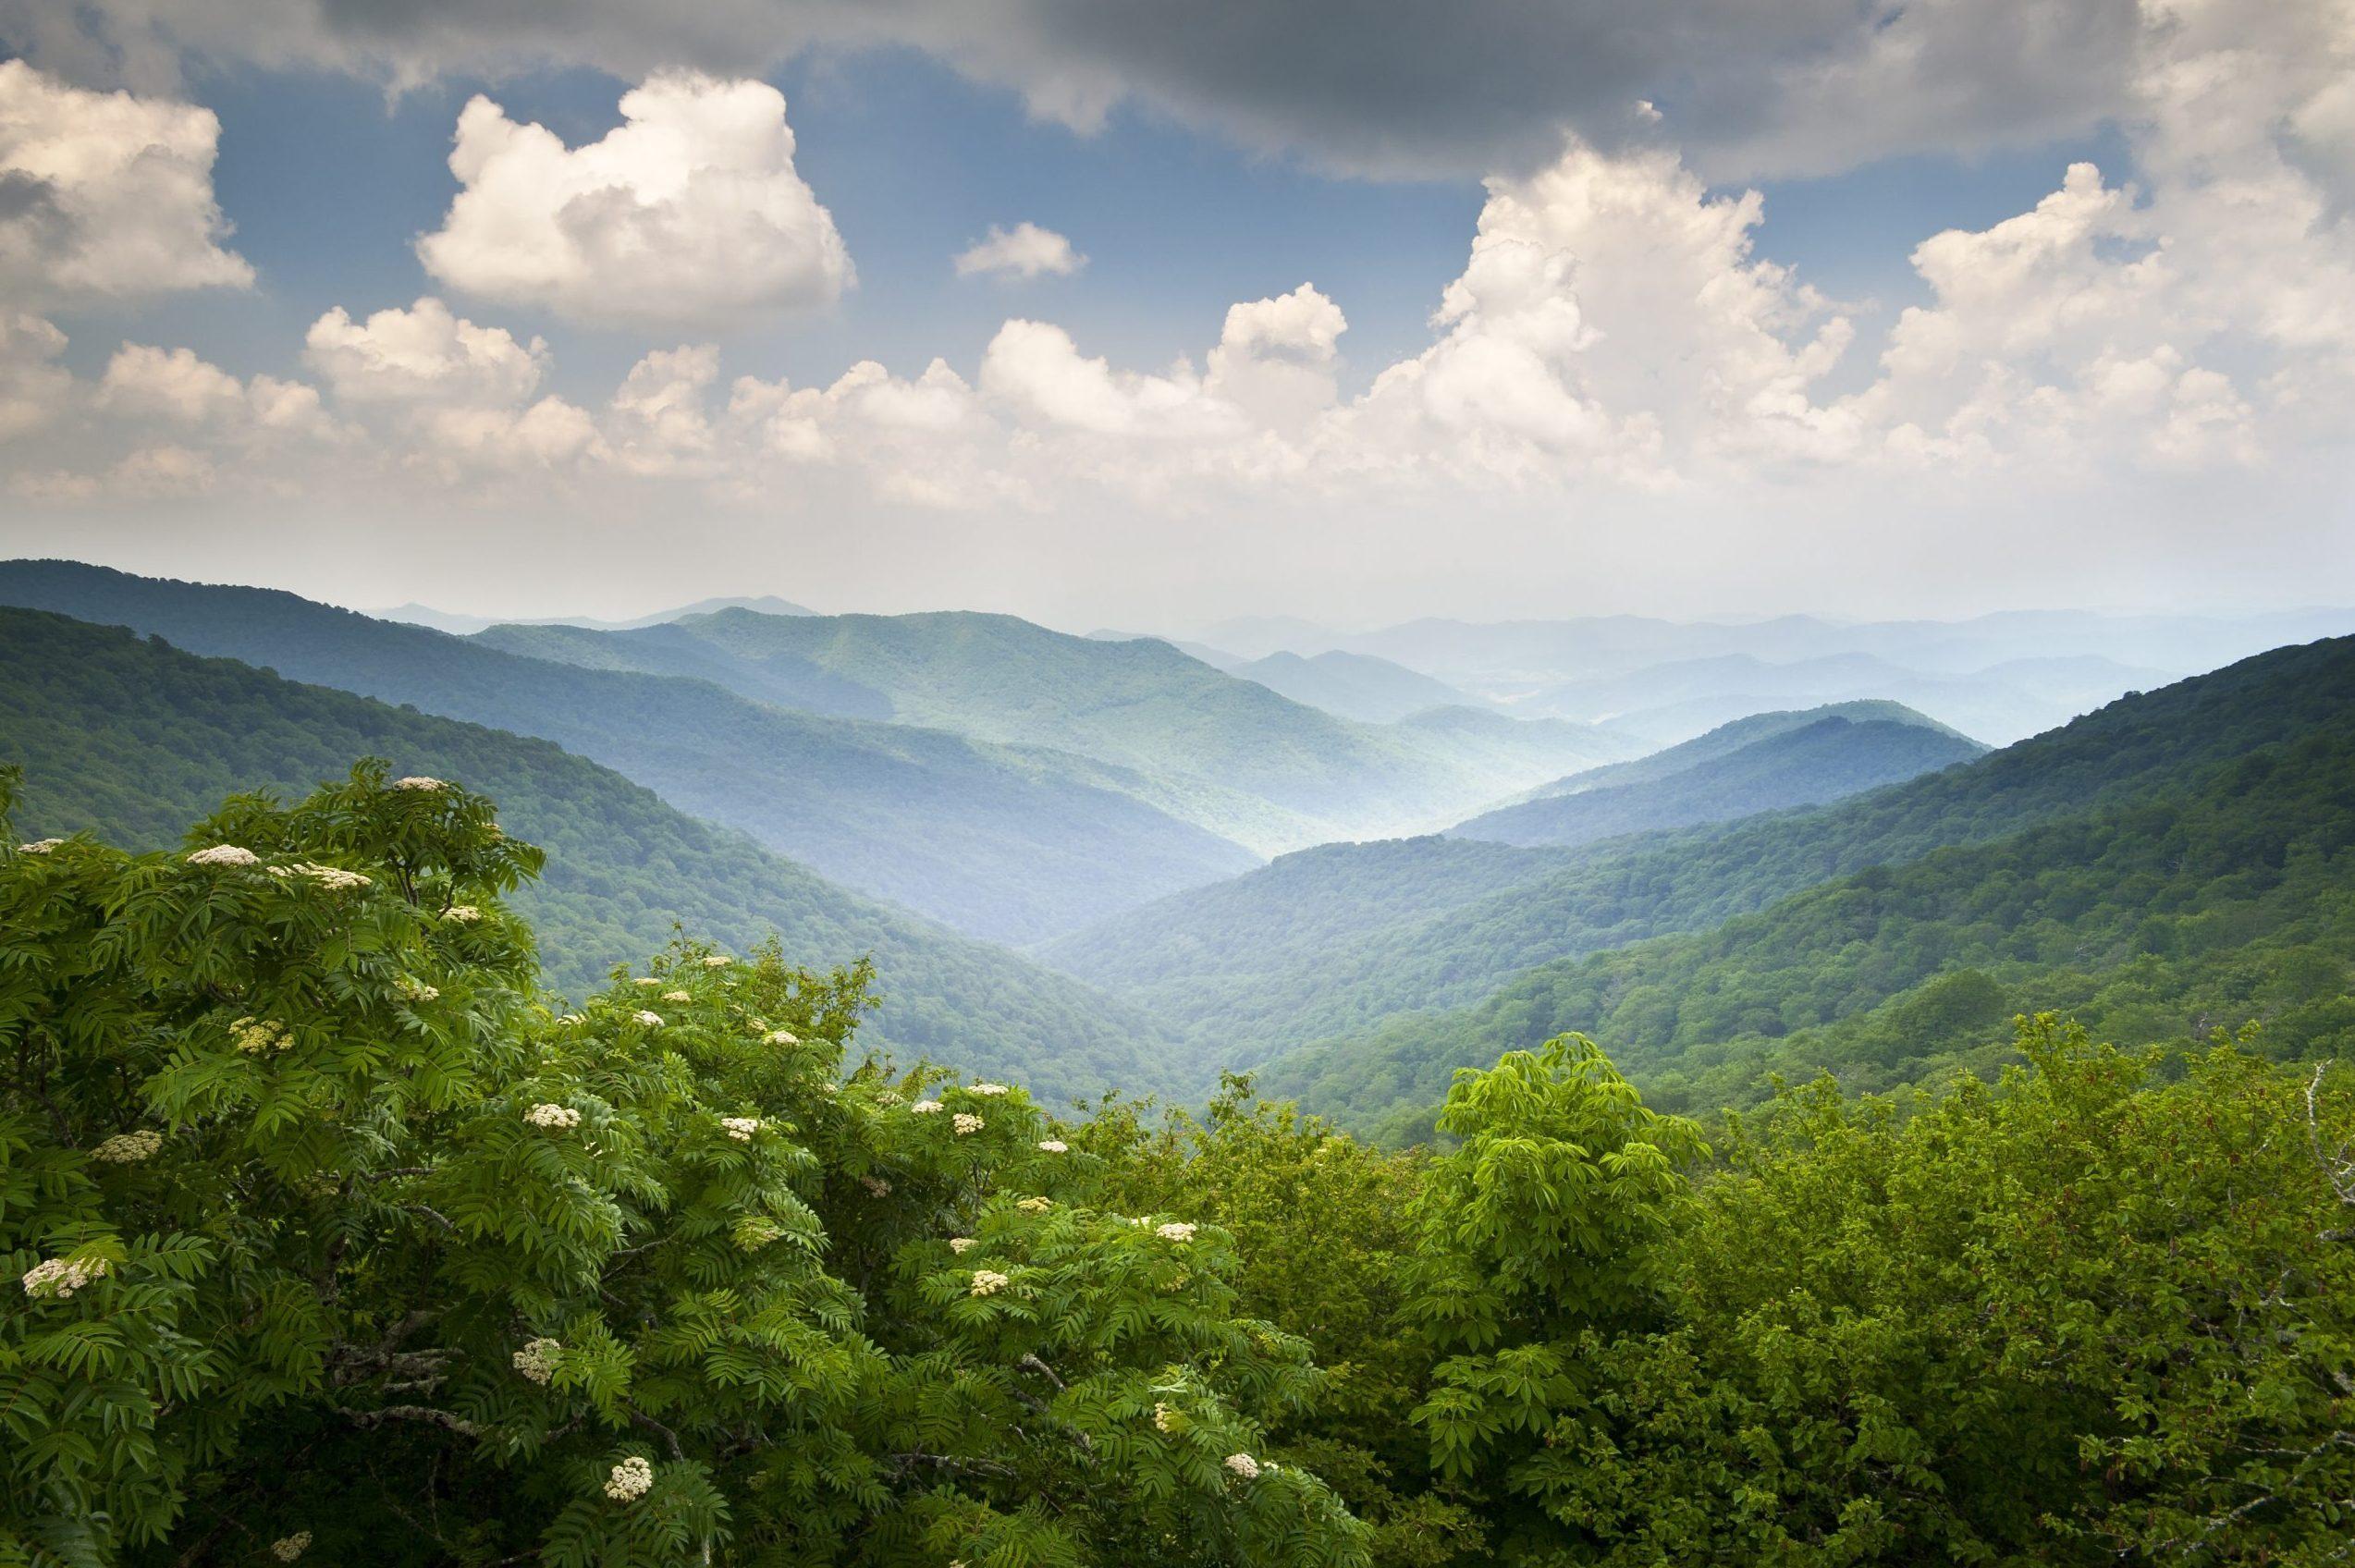 Blue Ridge Parkway Scenic Mountains Overlook Summer Landscape Asheville NC